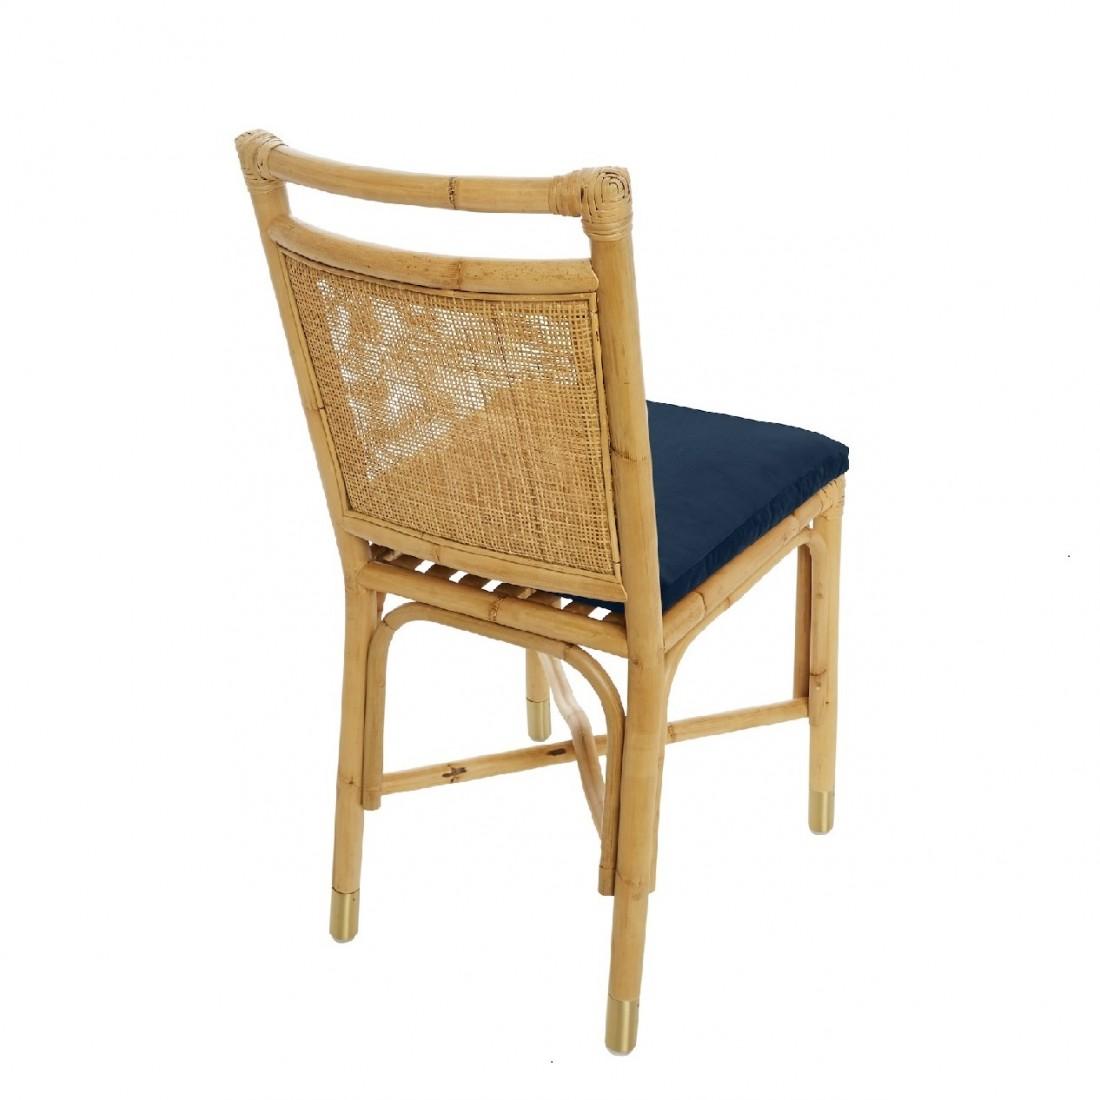 Chaise rotin et velours Bleu nuit